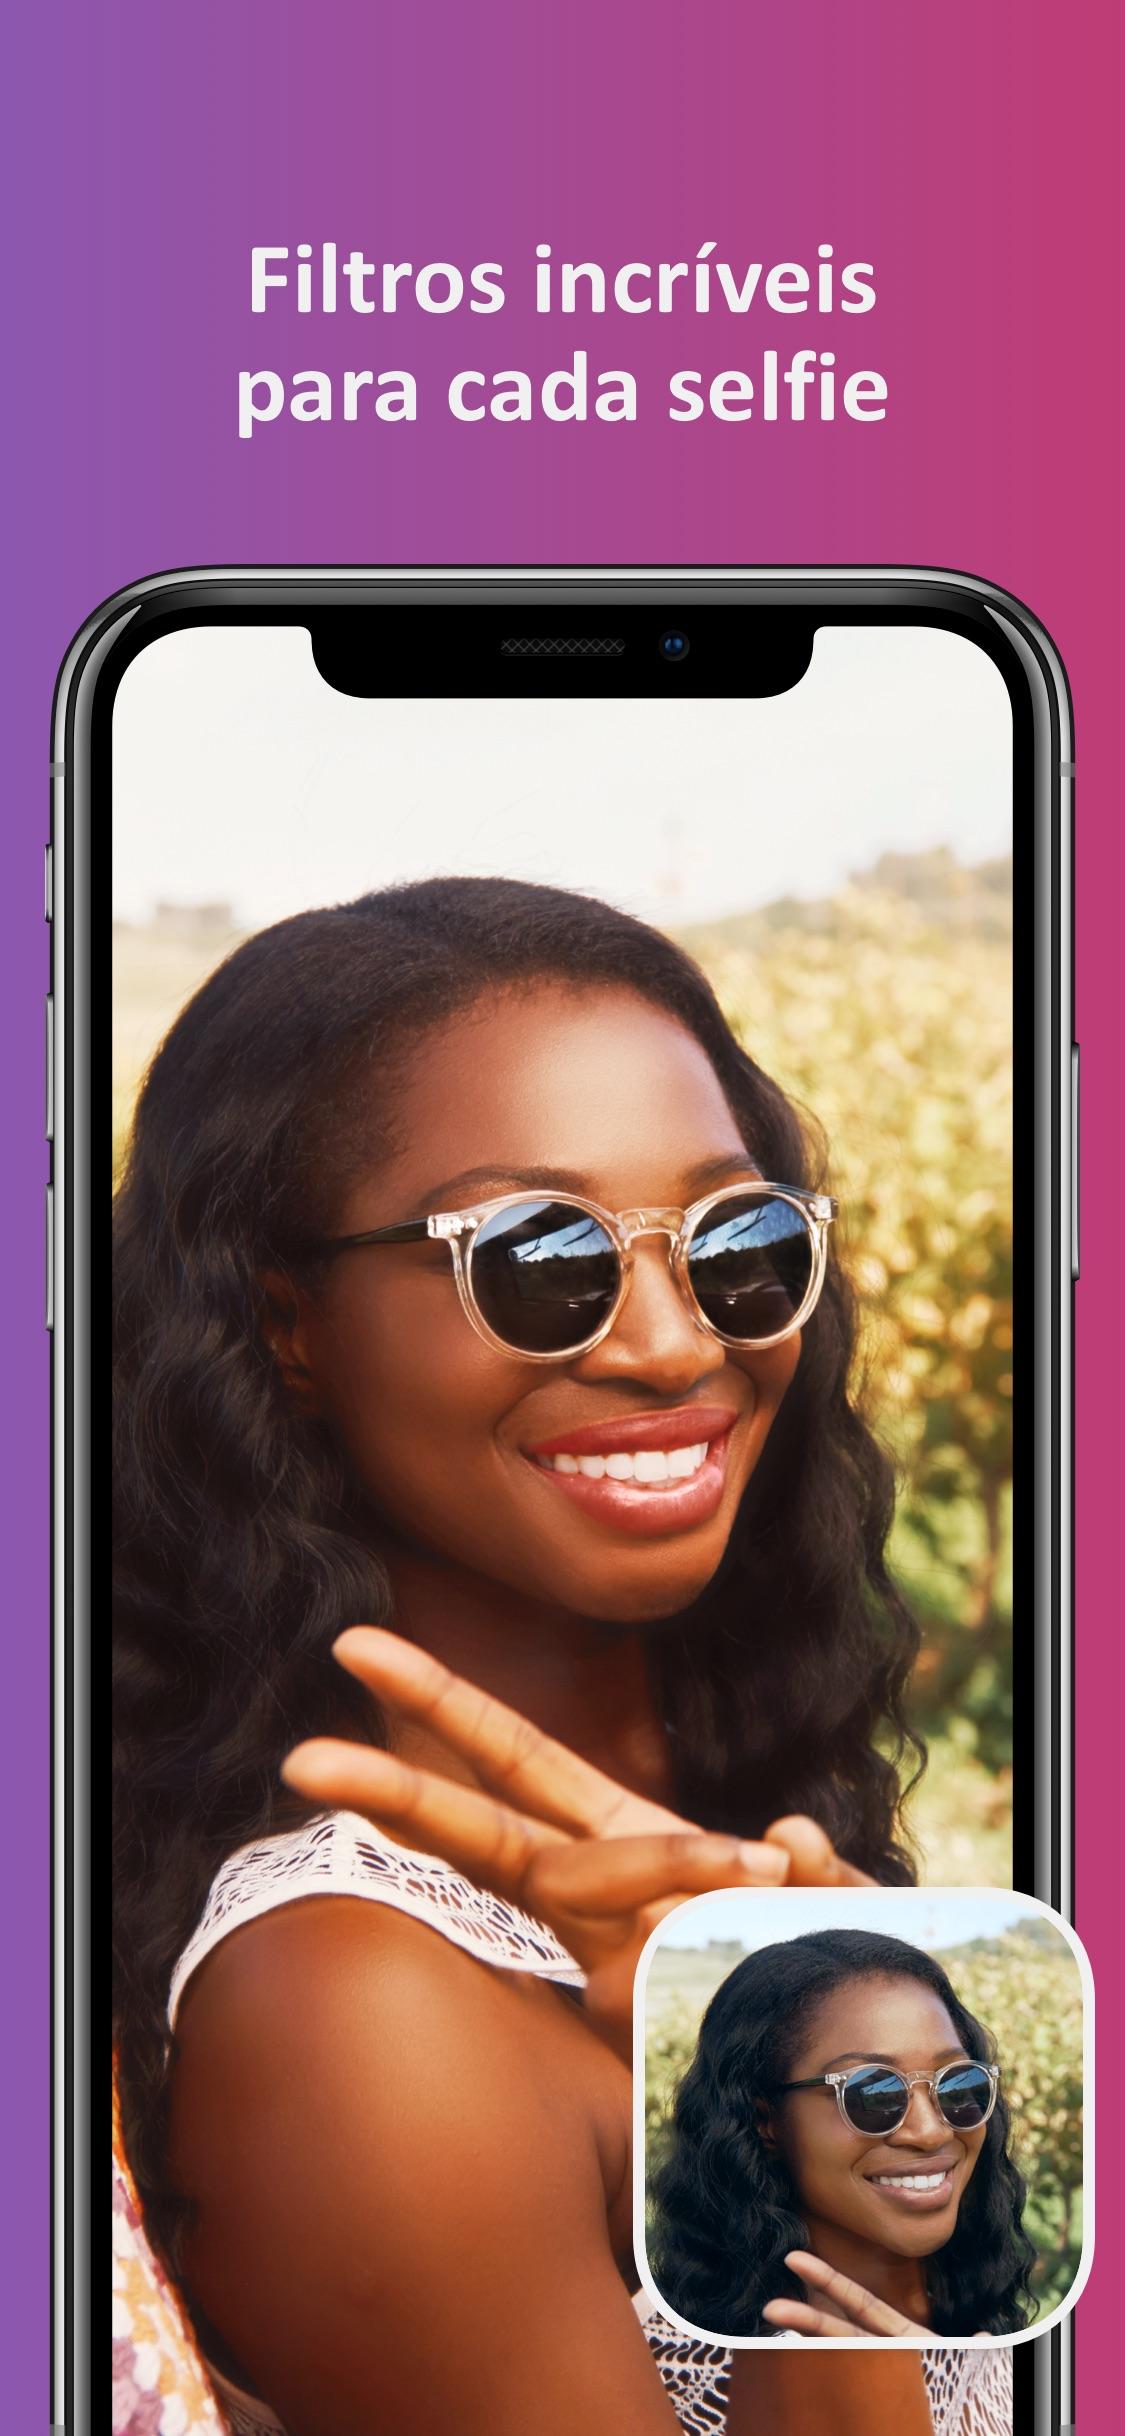 Facetune 2 Chega A App Store A Mais Nova Versao Do Famoso Editor De